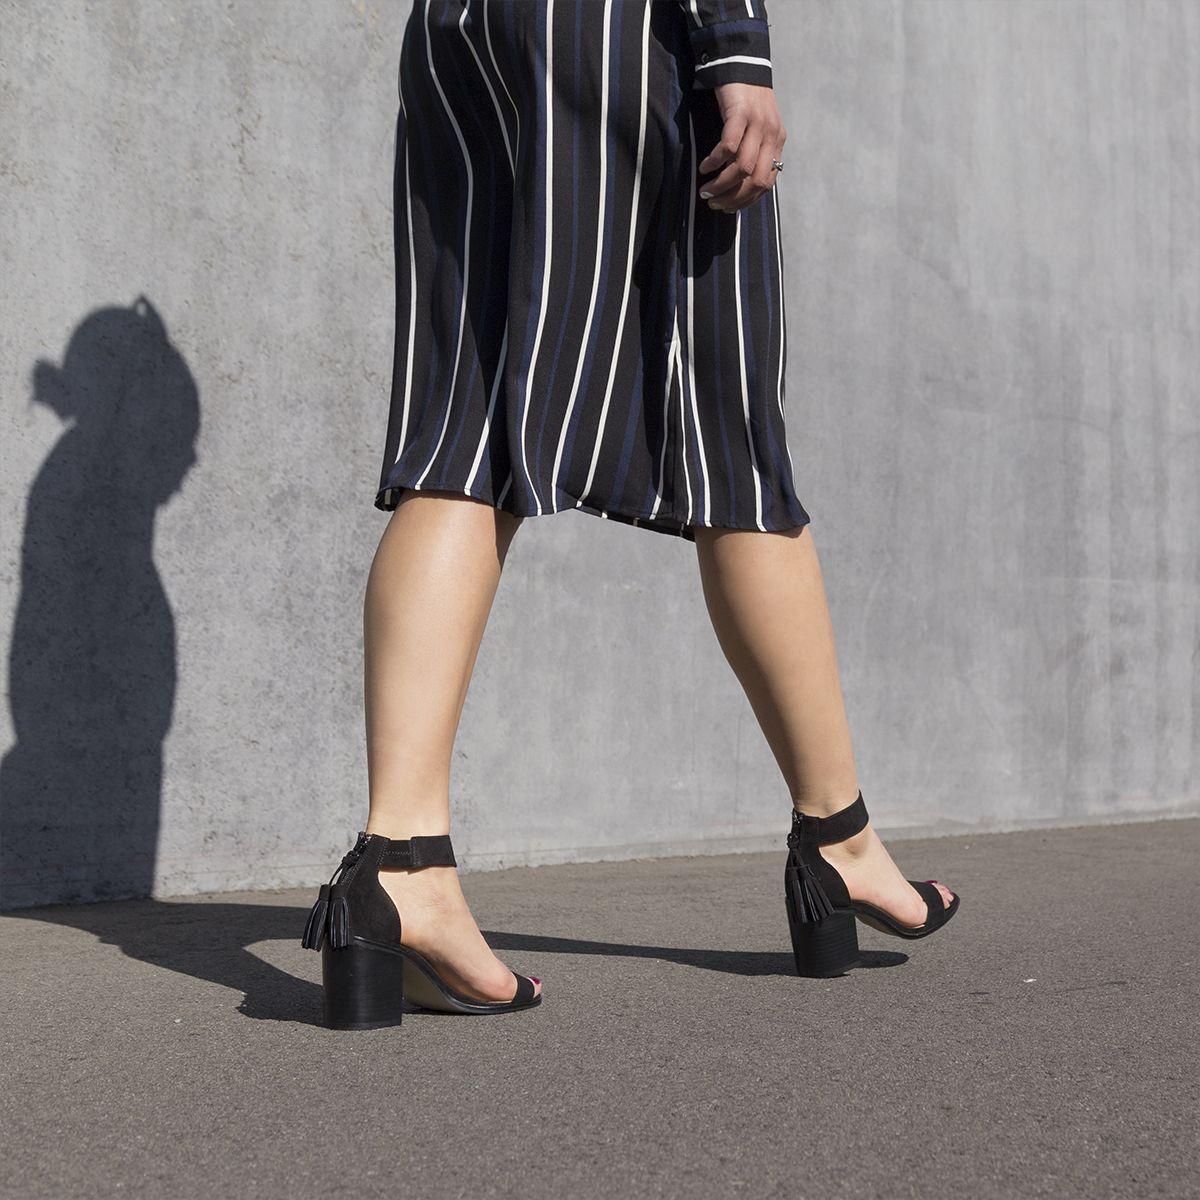 Womens sandals nz - The O Jays